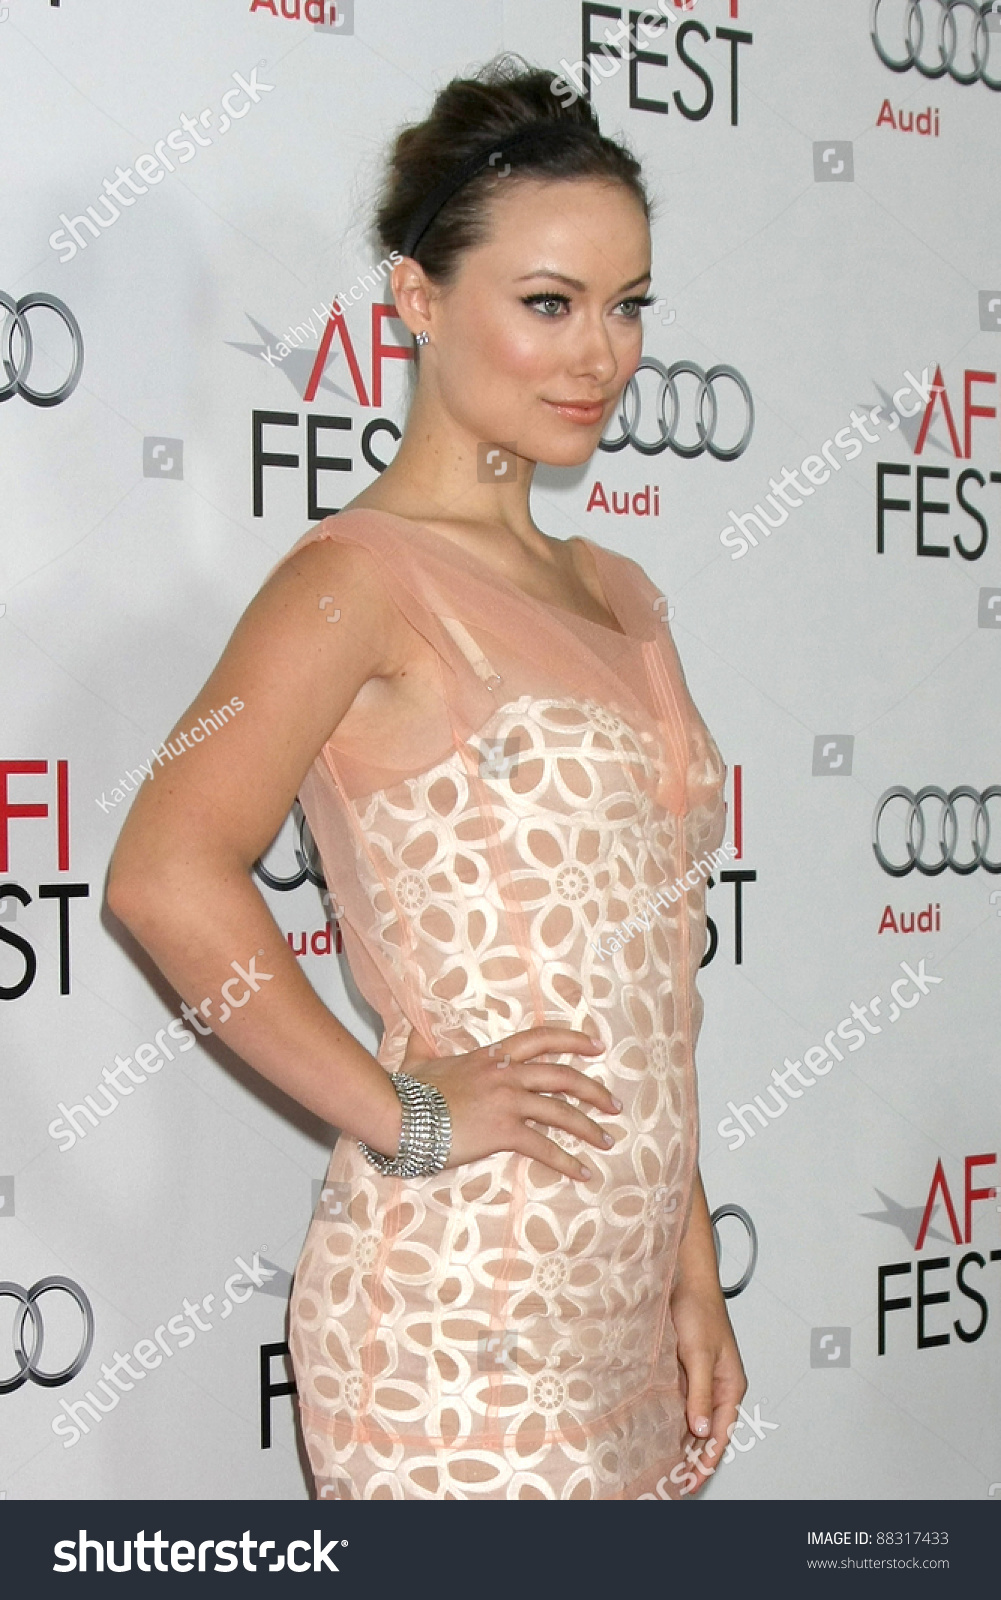 0d835472badf5 LOS ANGELES - NOV 6: Olivia Wilde arrives at the